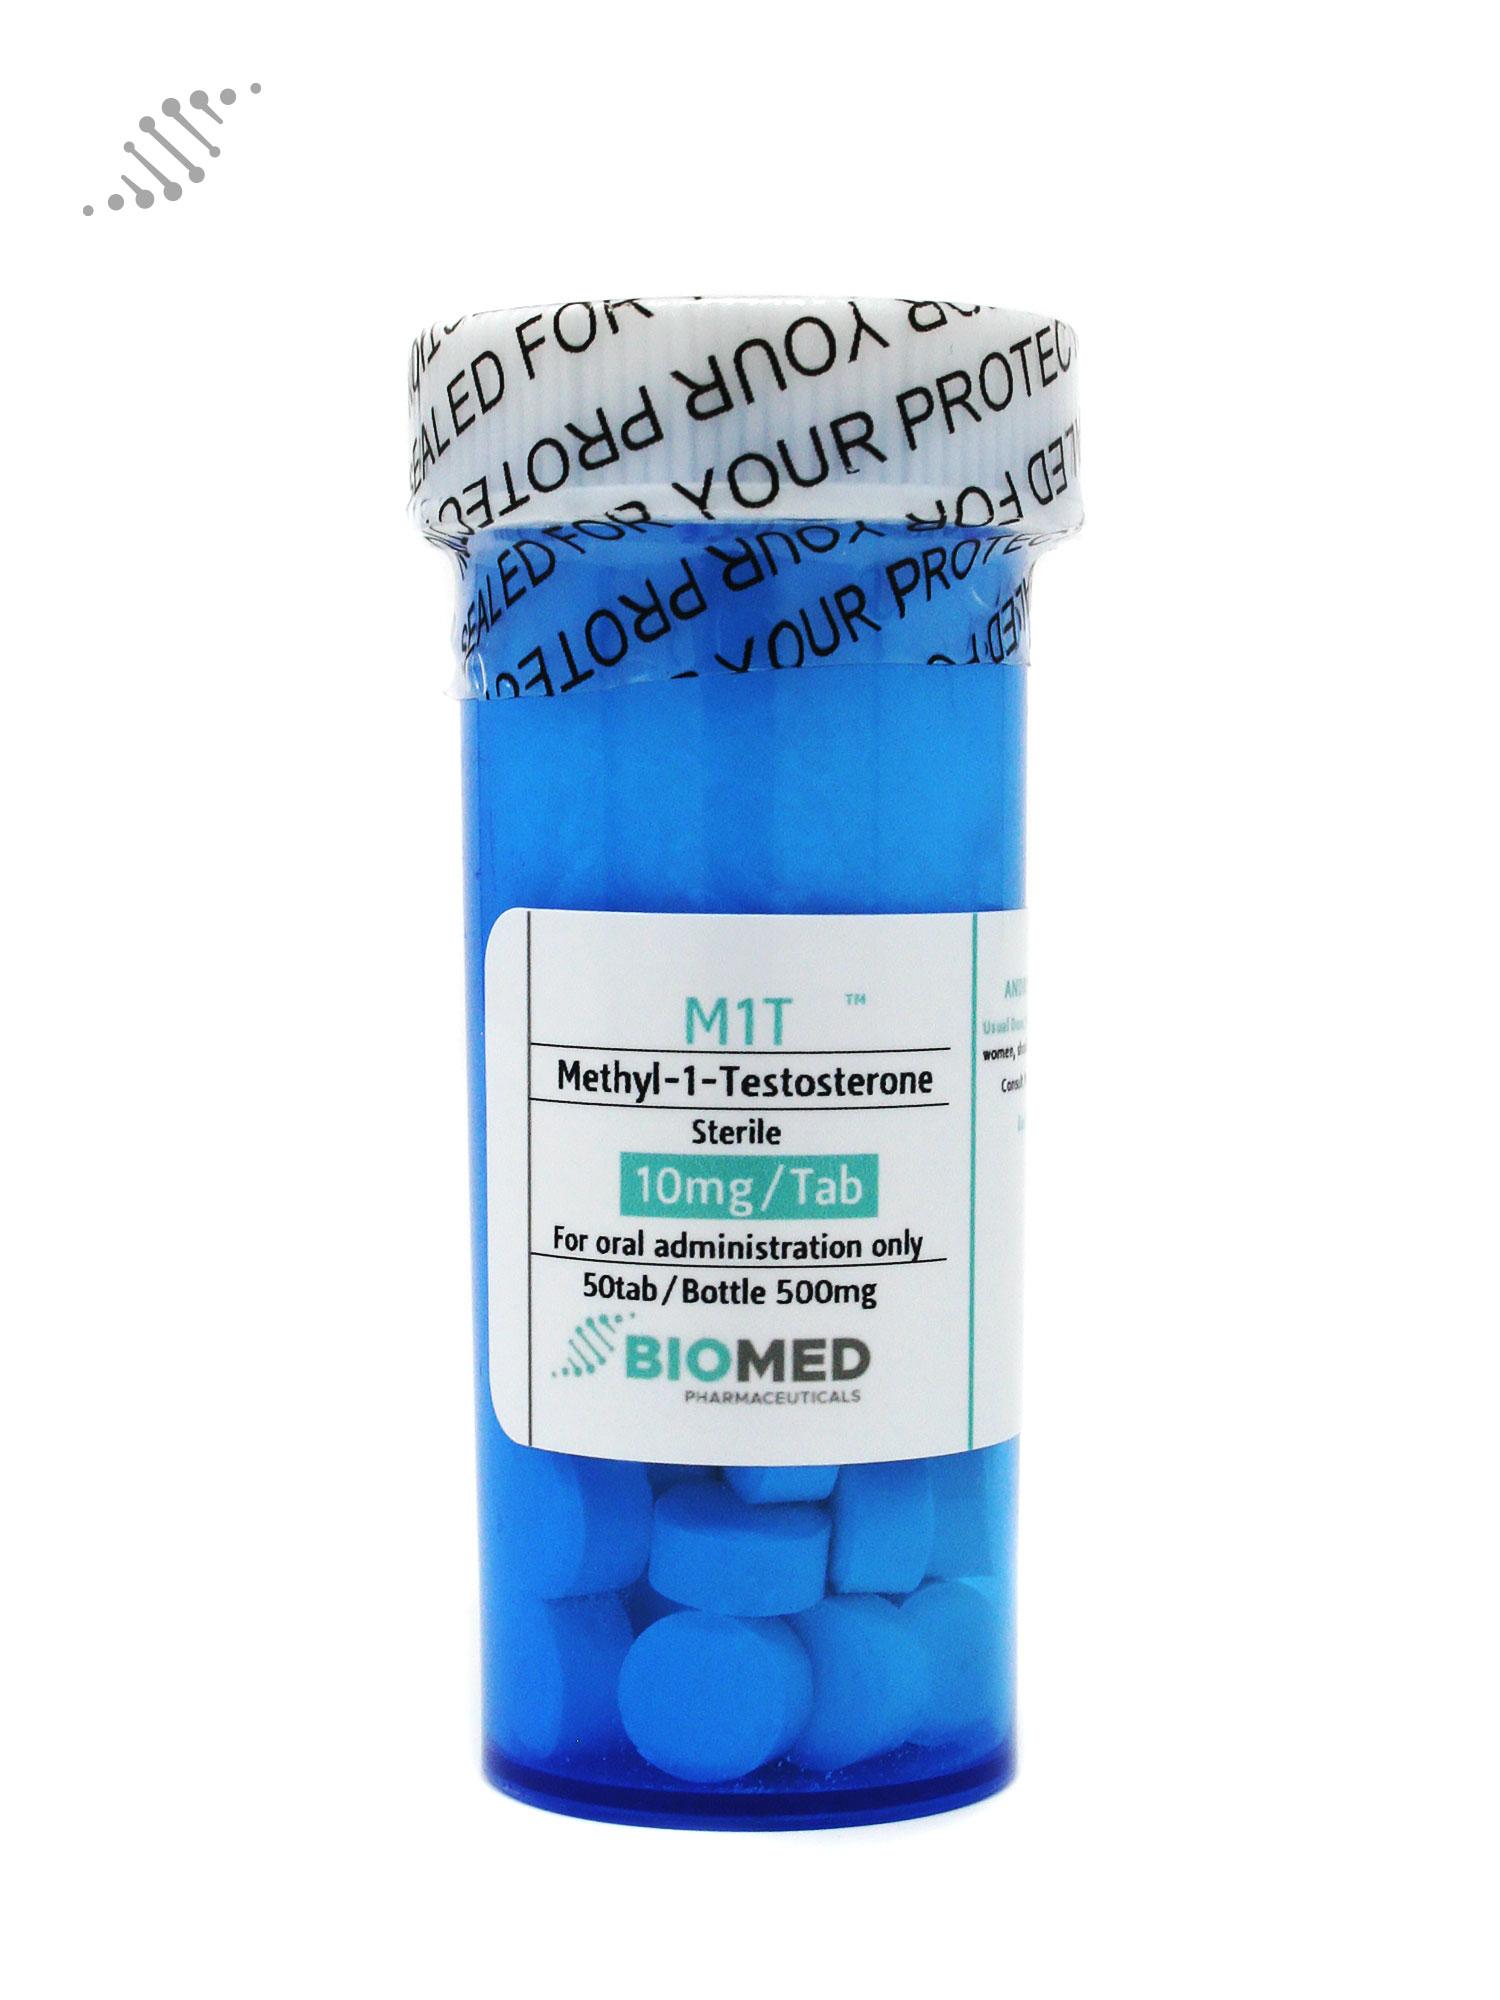 M1T Methyl-1-Testosterone 10mg/tab